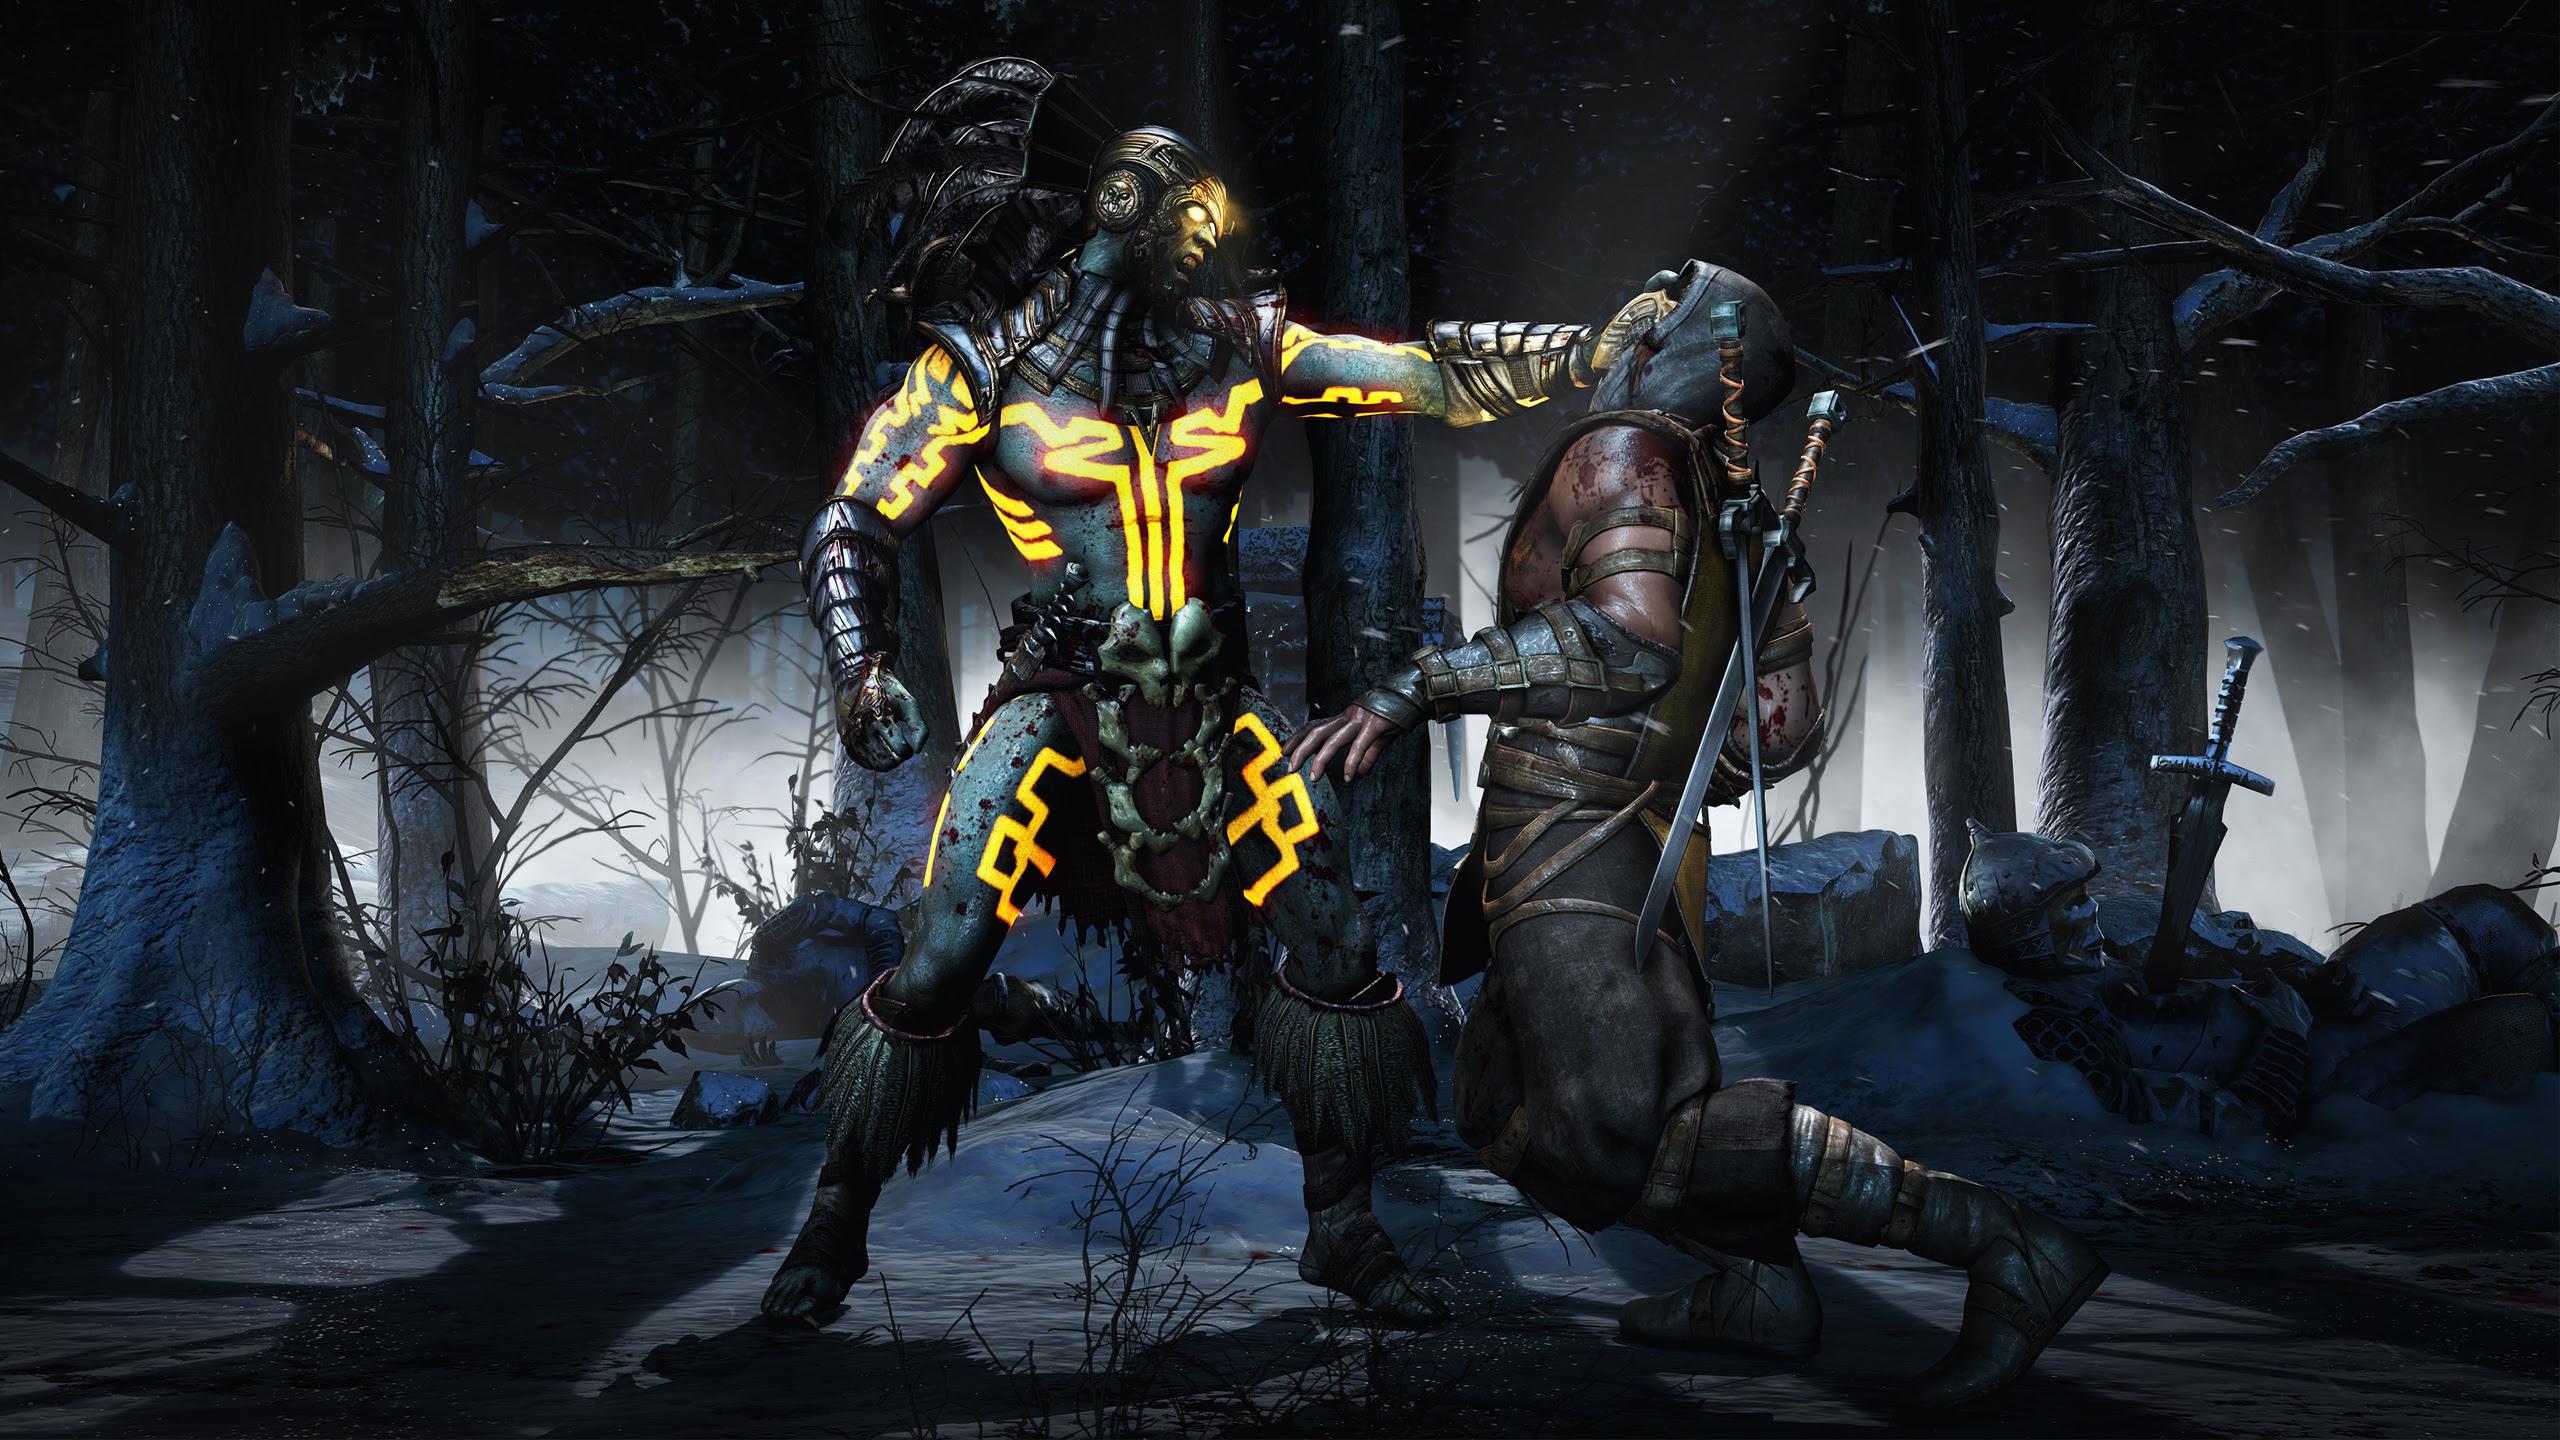 Kotal Scorpion Mortal Kombat X Wallpapers Wallpapers Hd